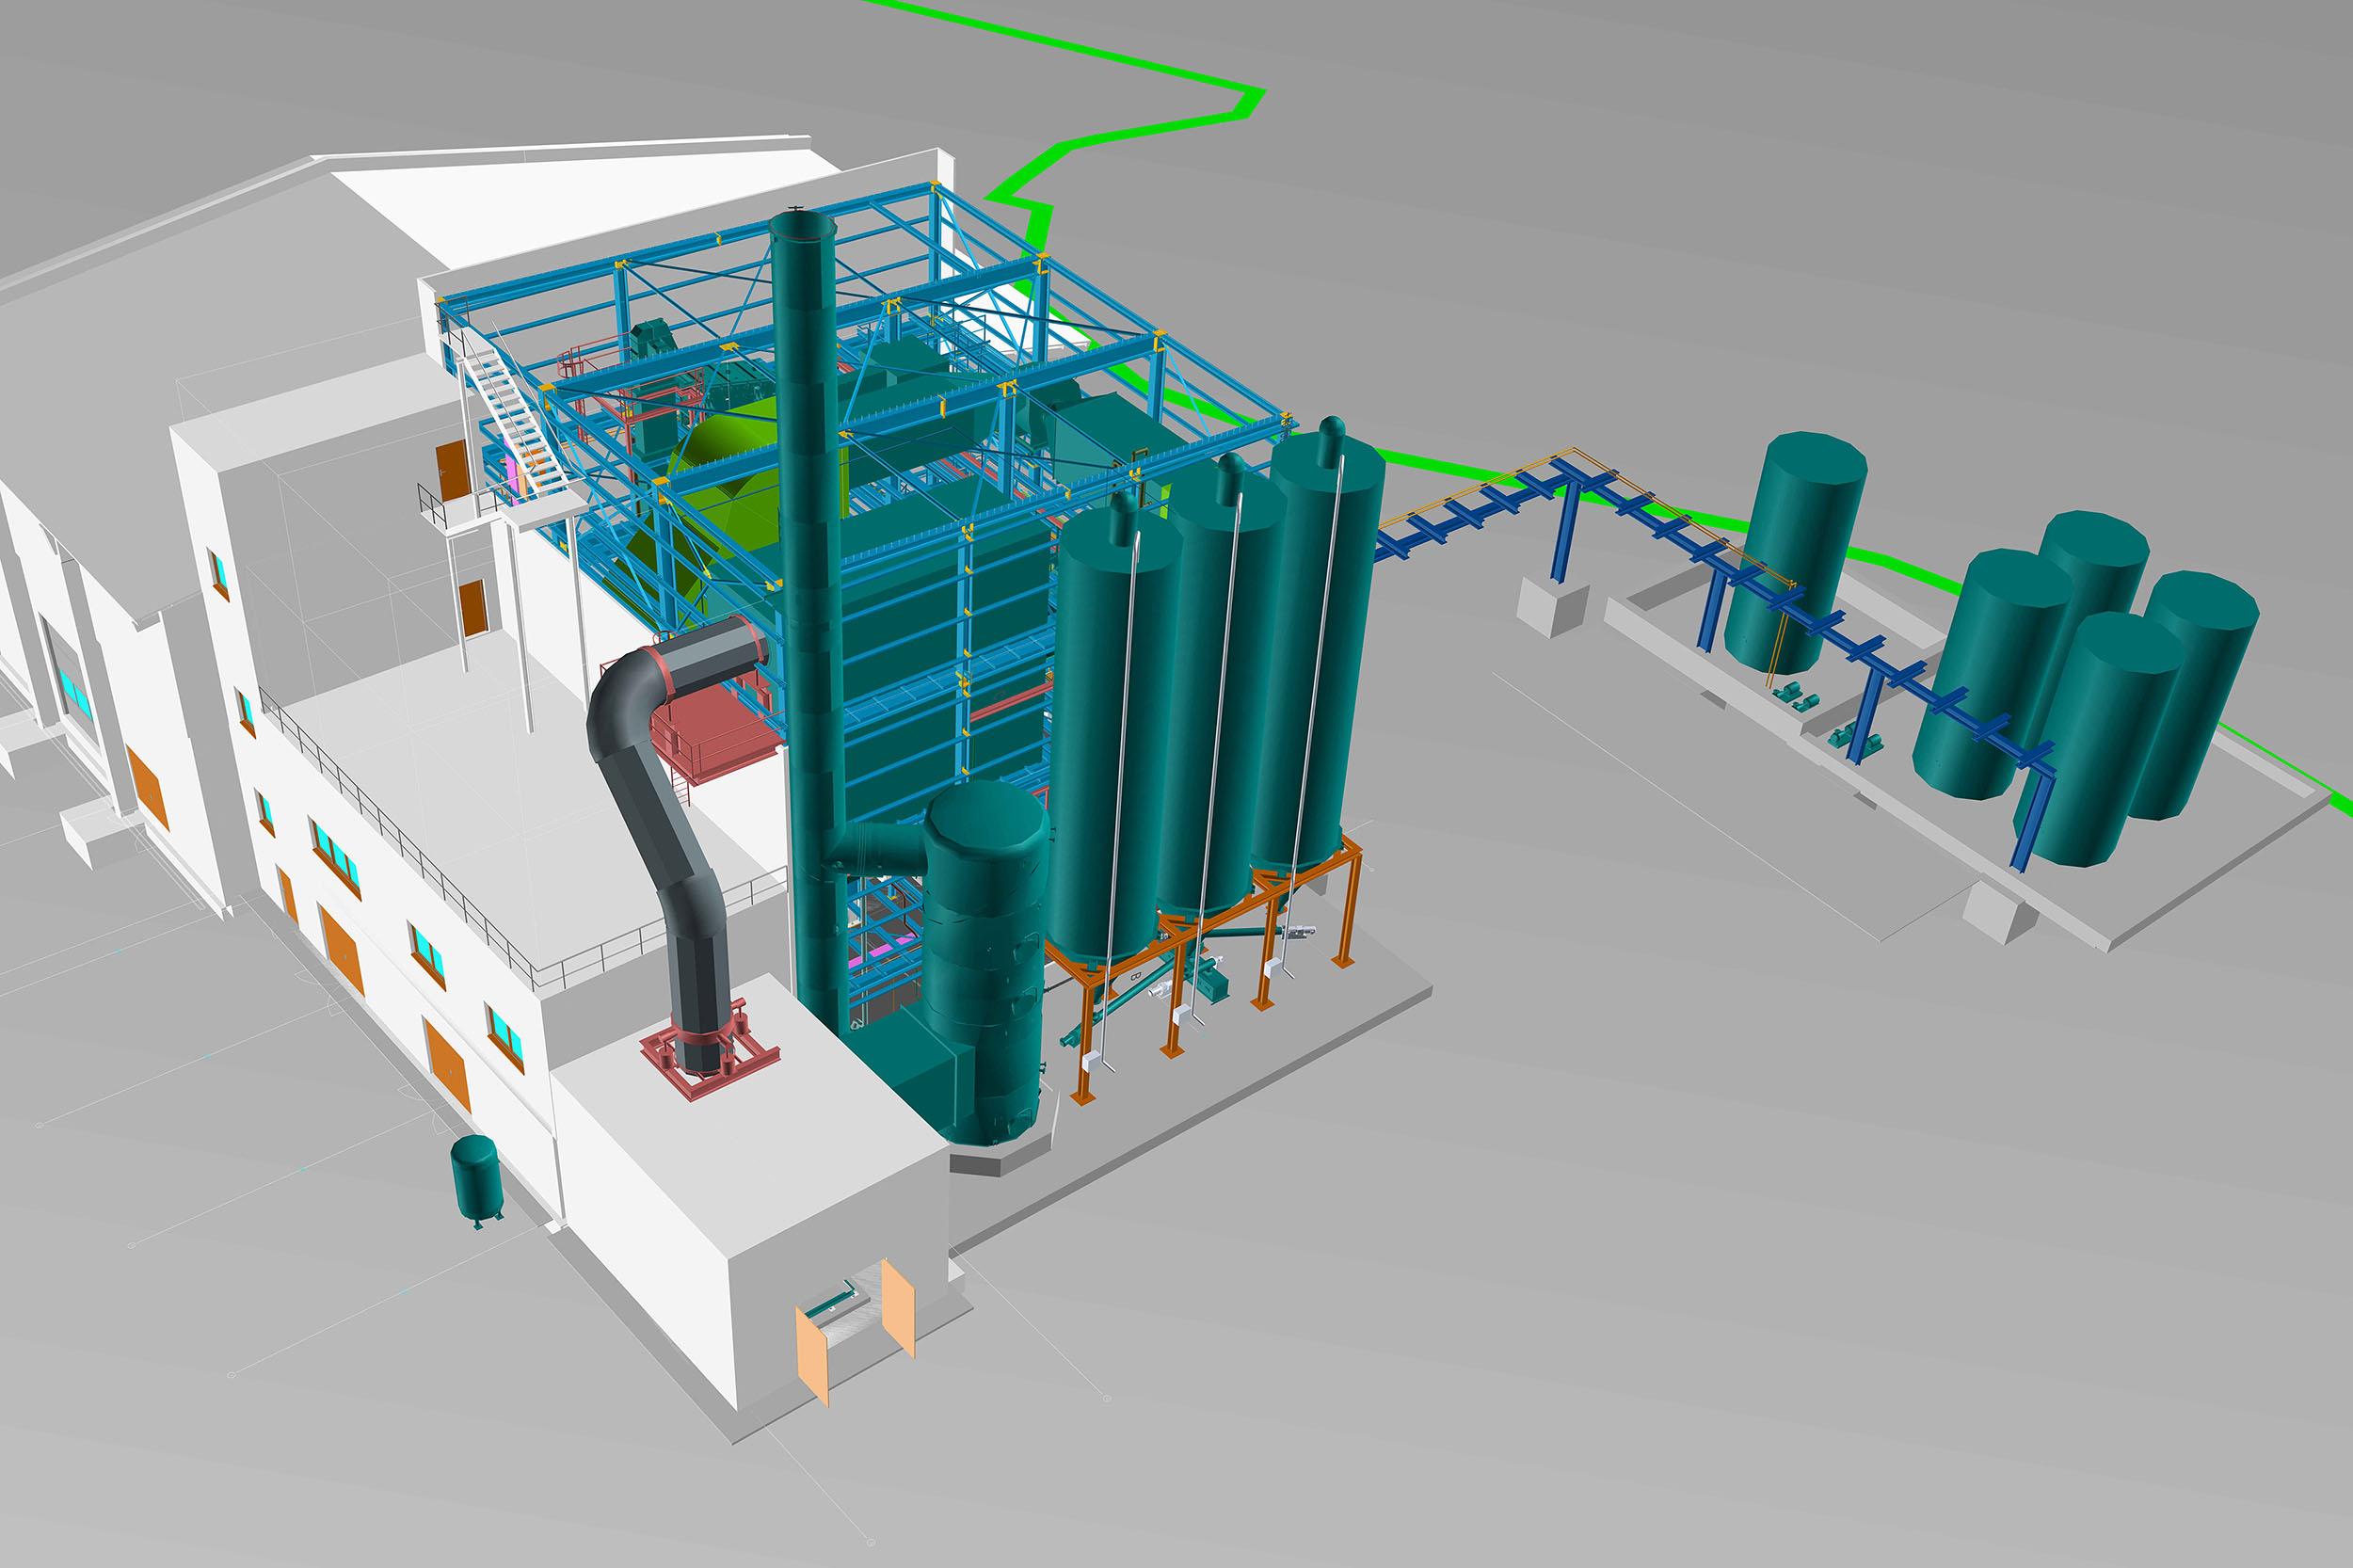 PHOS4green_Glatt-Seraplant-Phosphat-Duenger-Produktion-Planung_3D